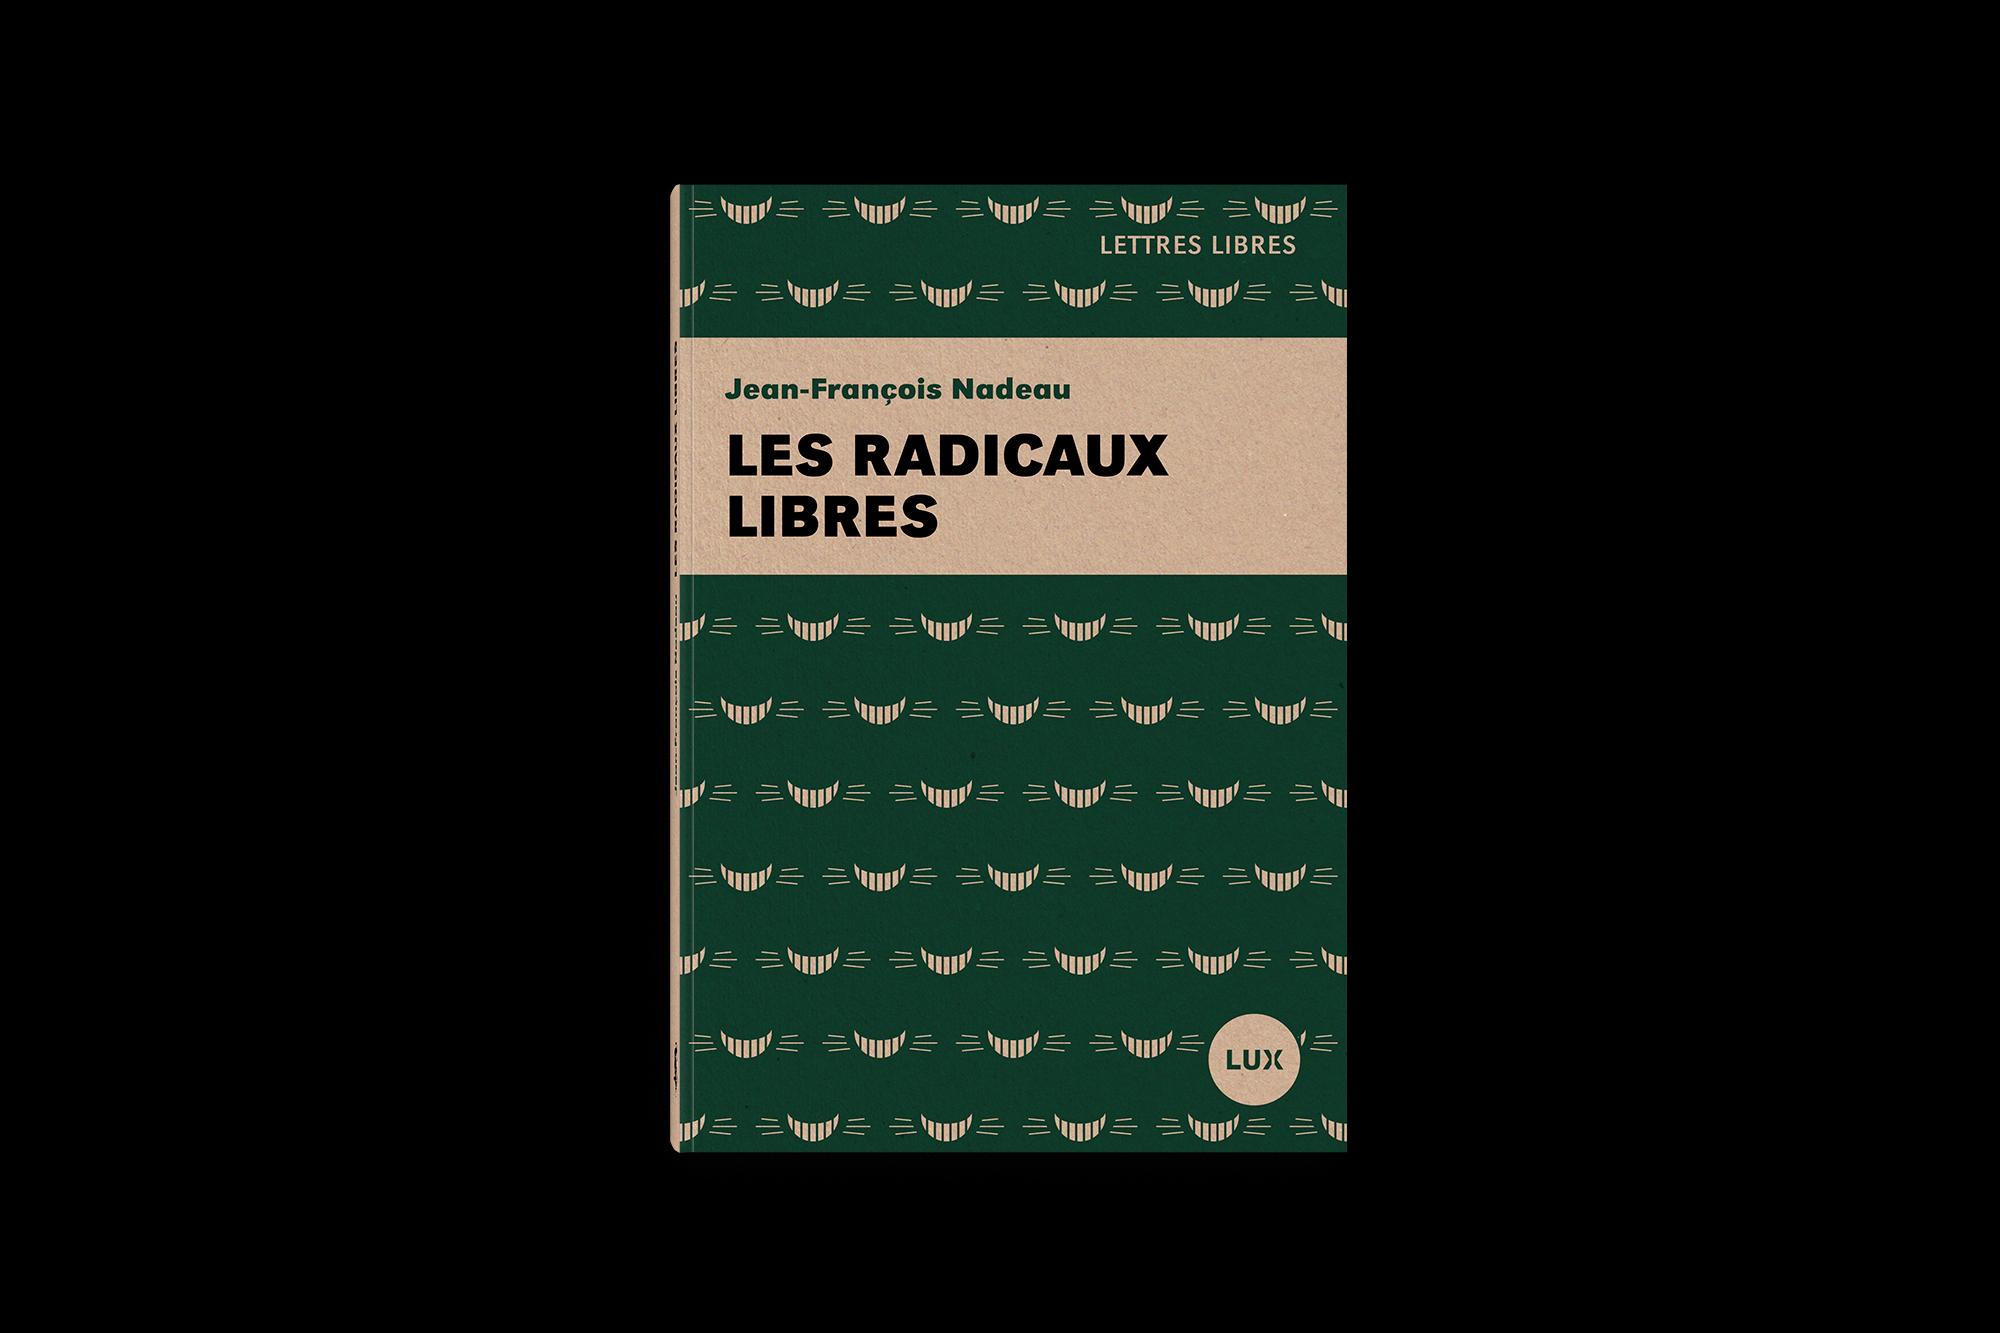 Lettres-libres-mockup-Les-radicaux-libres